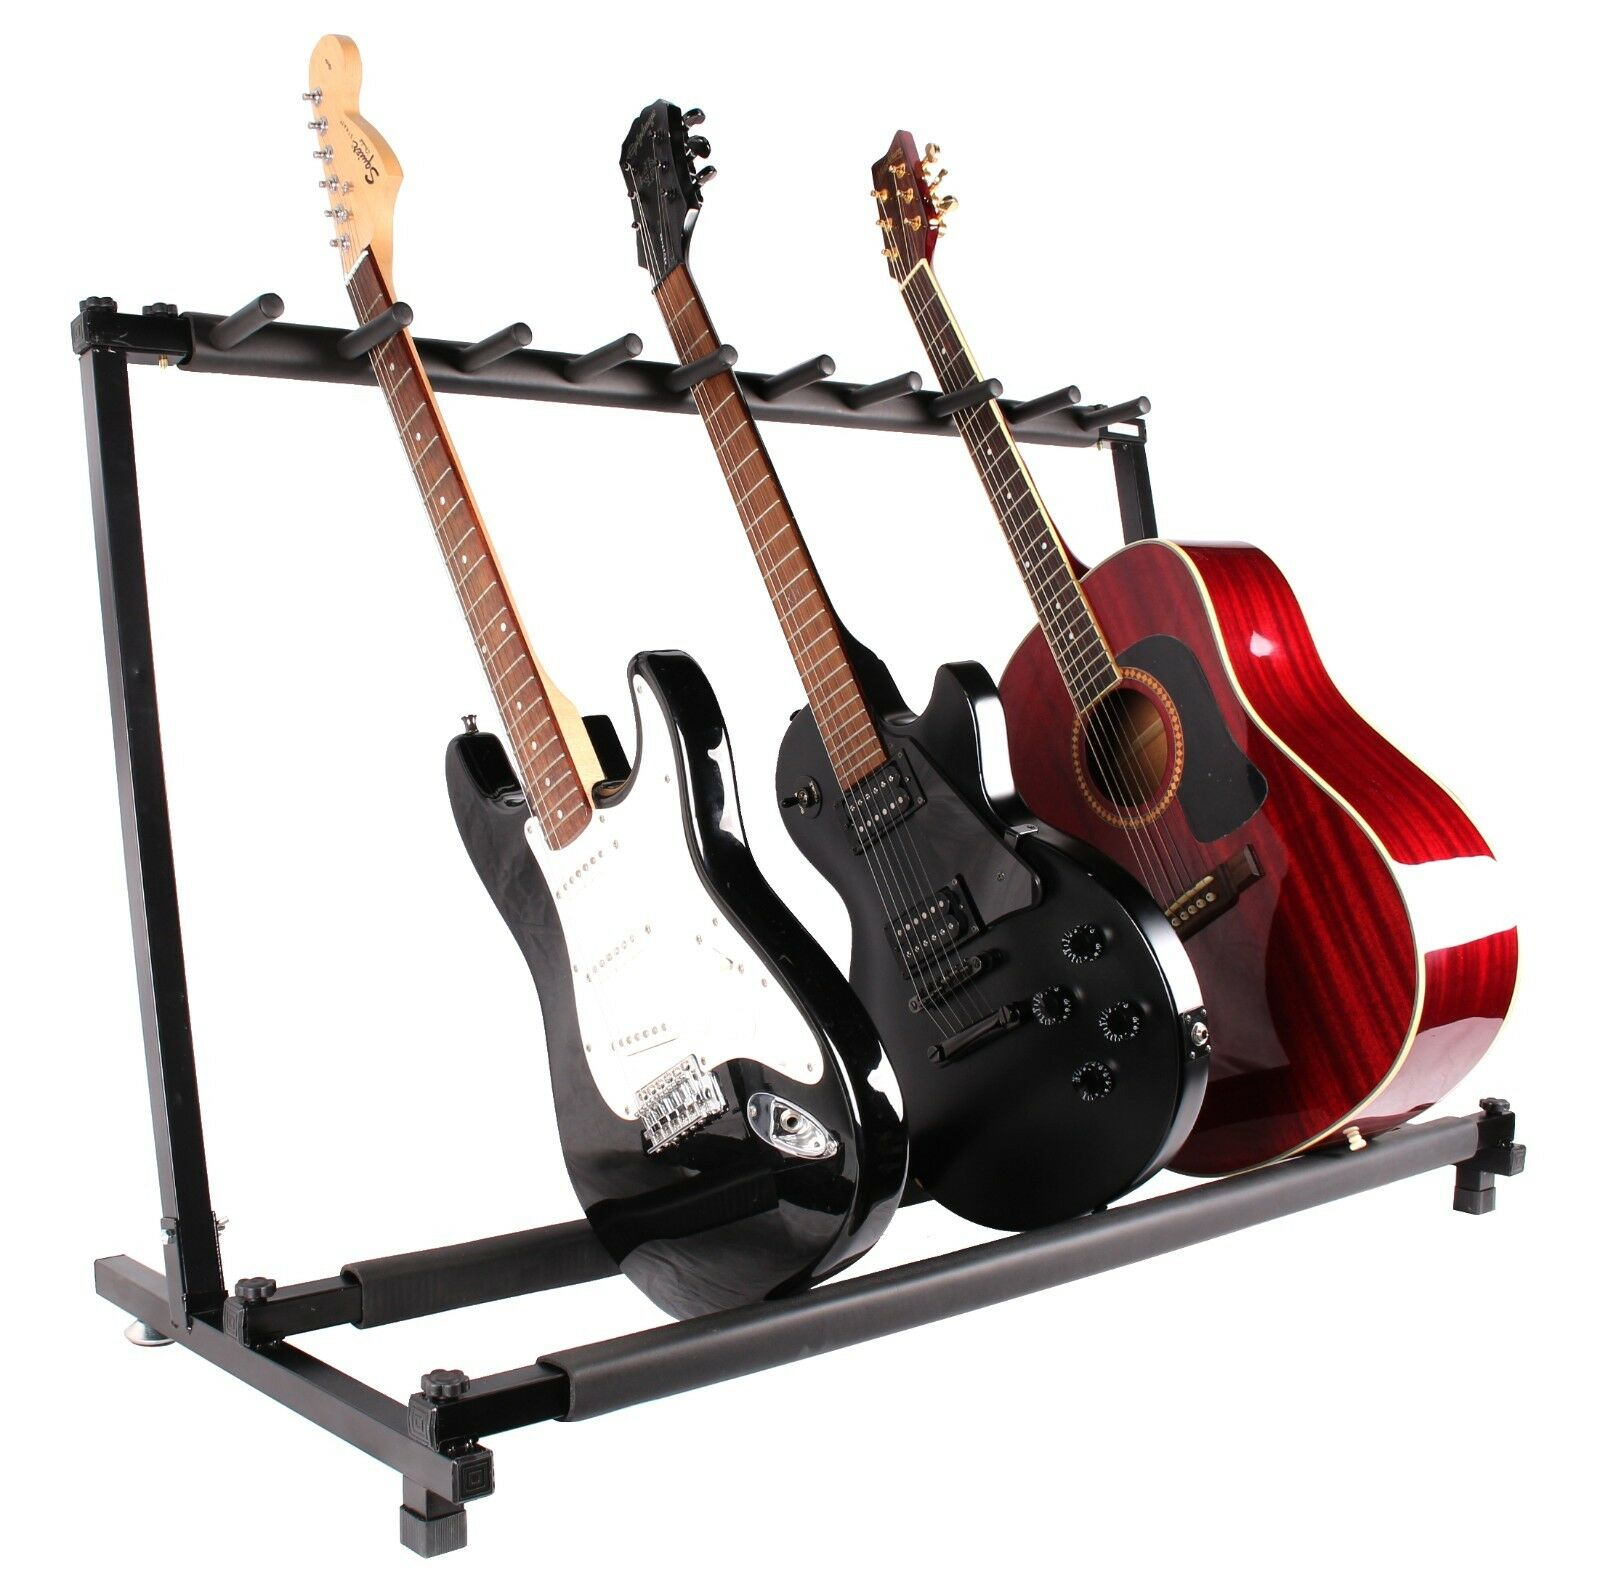 guitar stand 9 holder guitar folding stand rack band stage bass acoustic guitar ebay. Black Bedroom Furniture Sets. Home Design Ideas